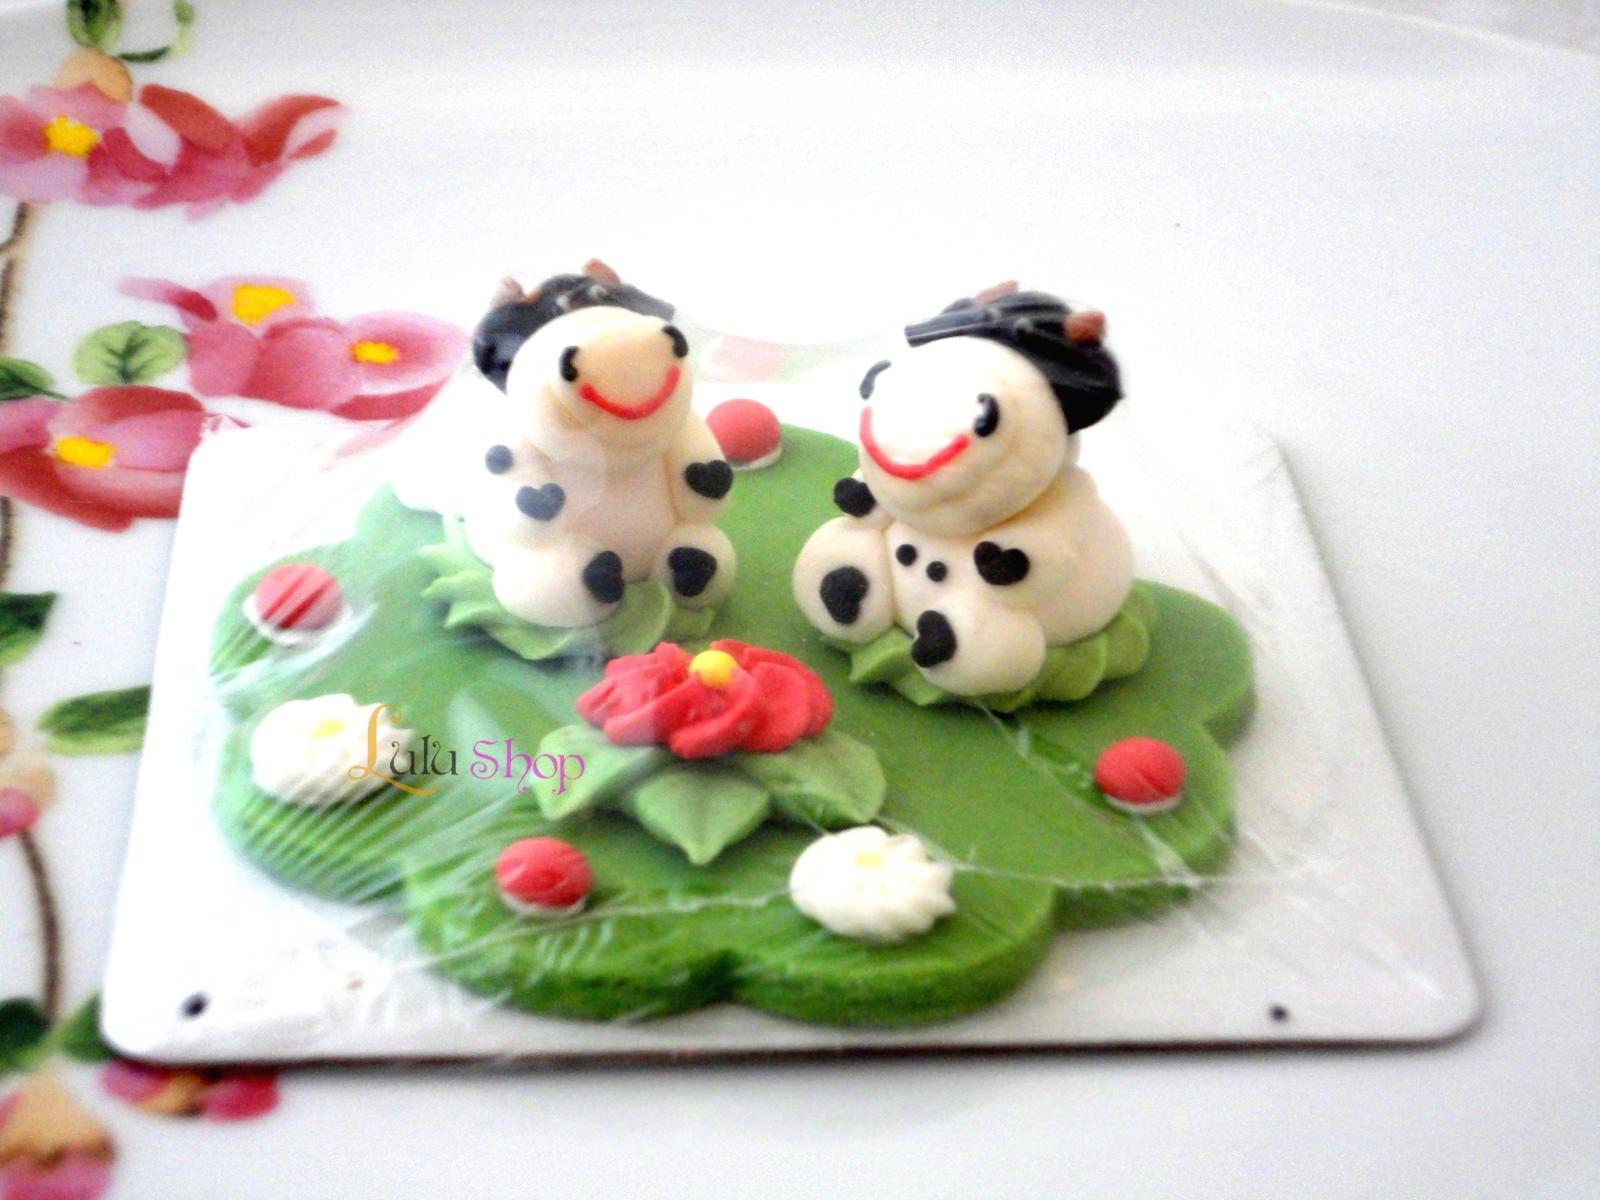 Decoration patisserie anniversaire decoration patisserie anniversaire sur enperdresonlapin - Decoration cupcake anniversaire ...